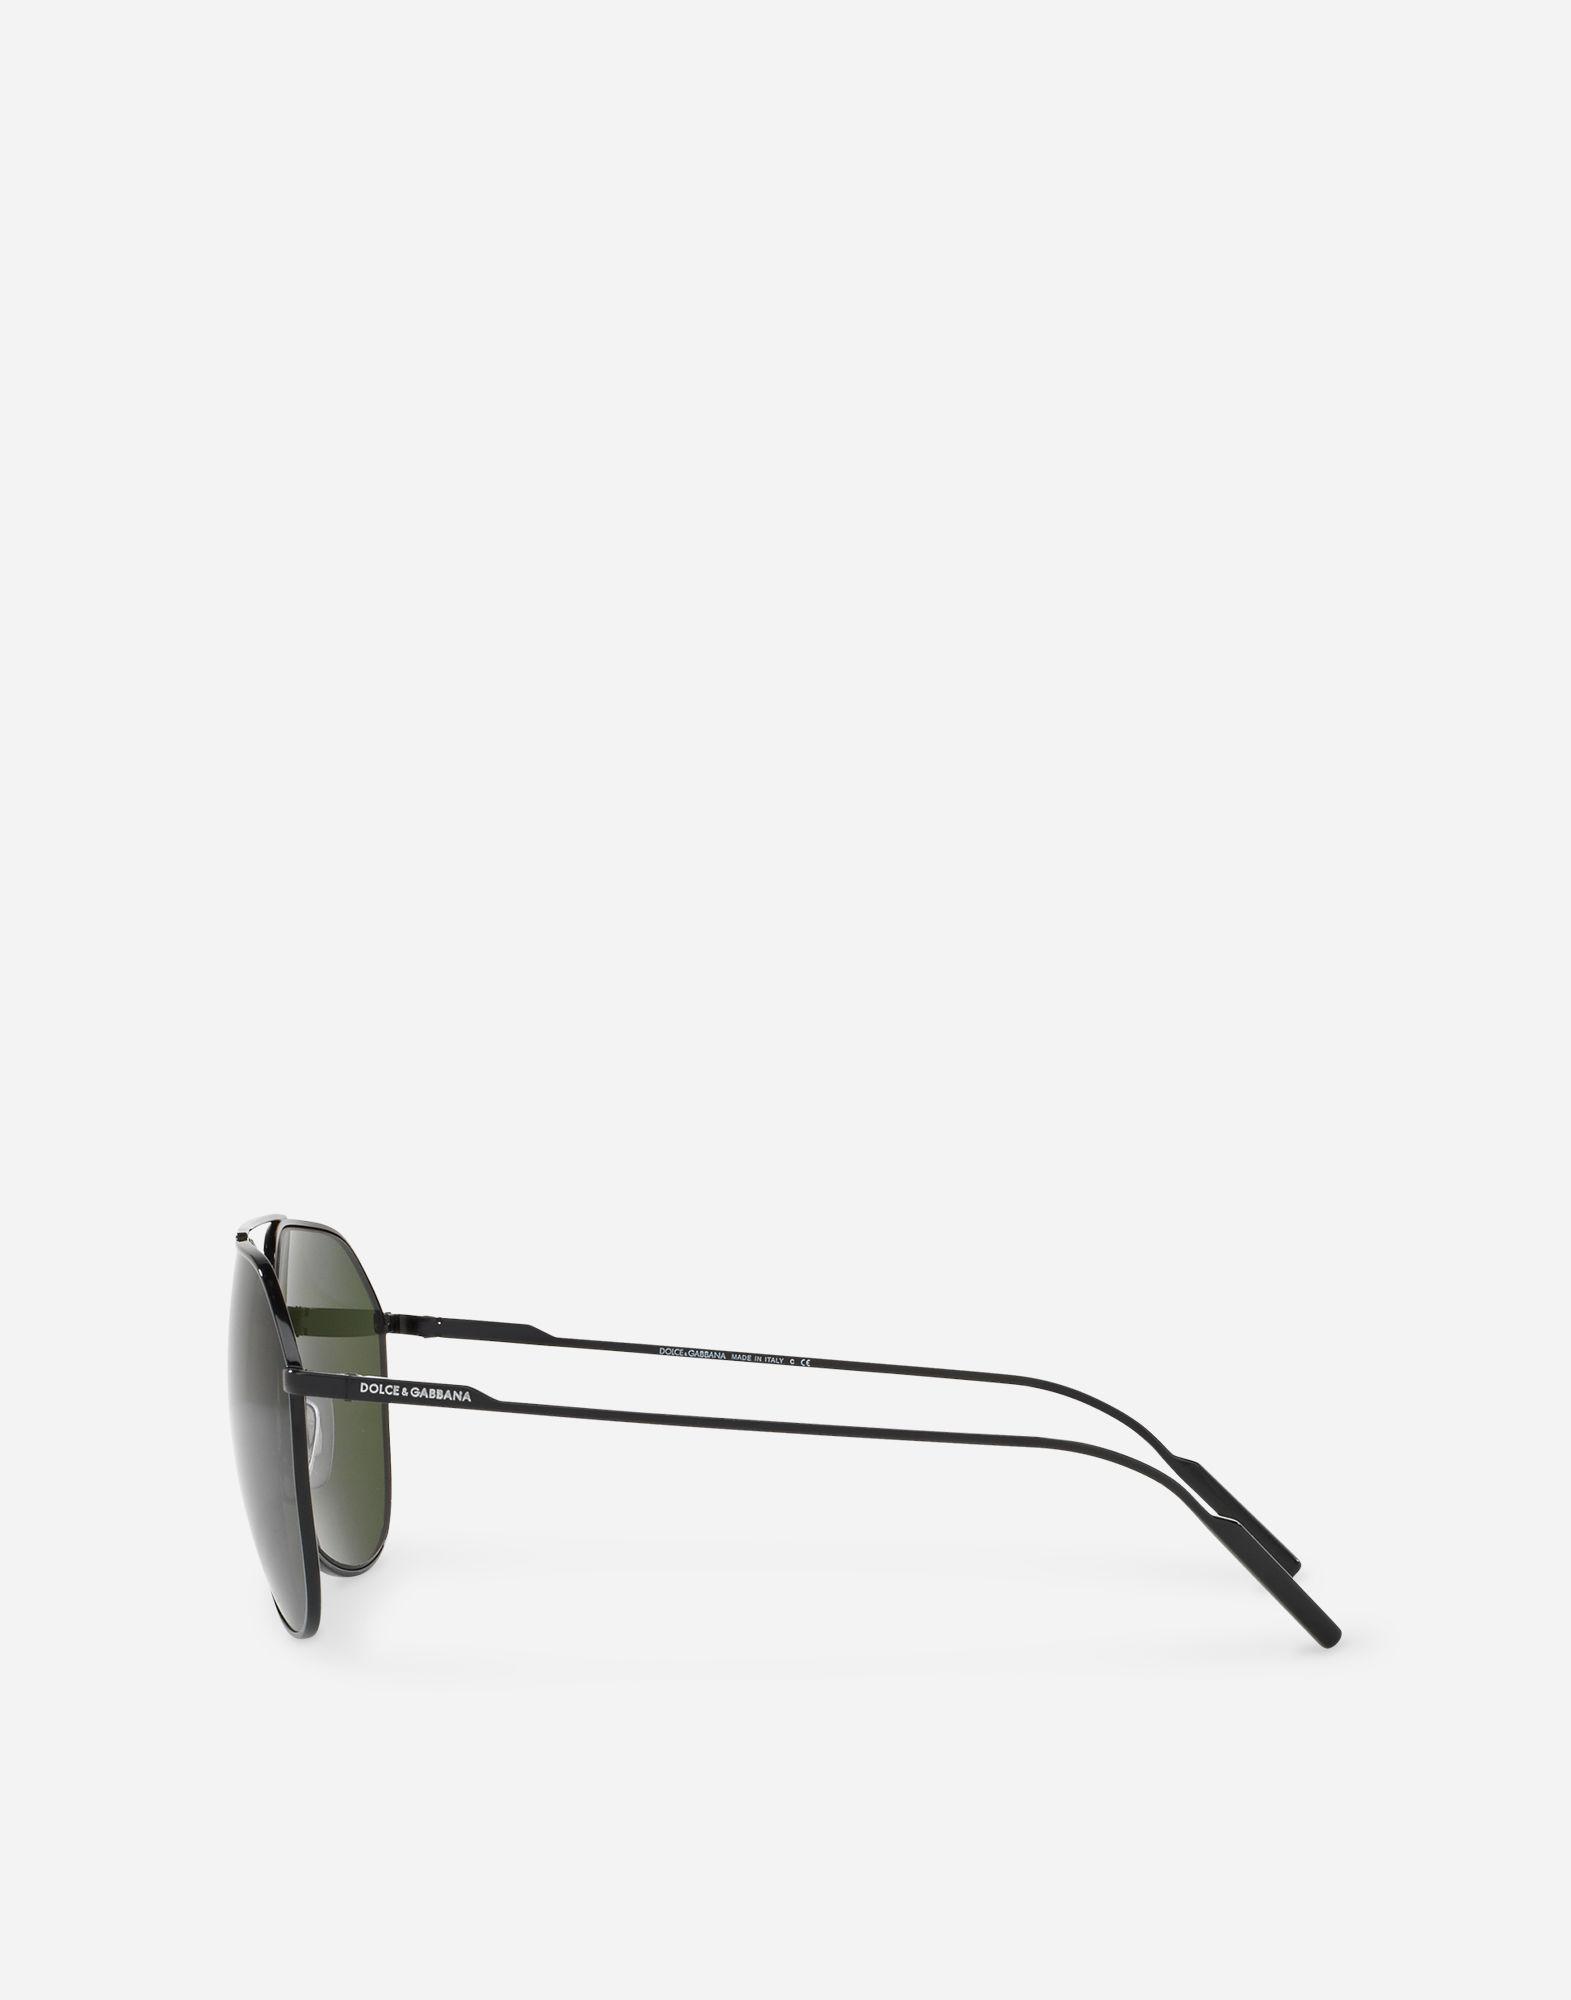 Dolce & Gabbana Metal Aviator Sunglasses for Men